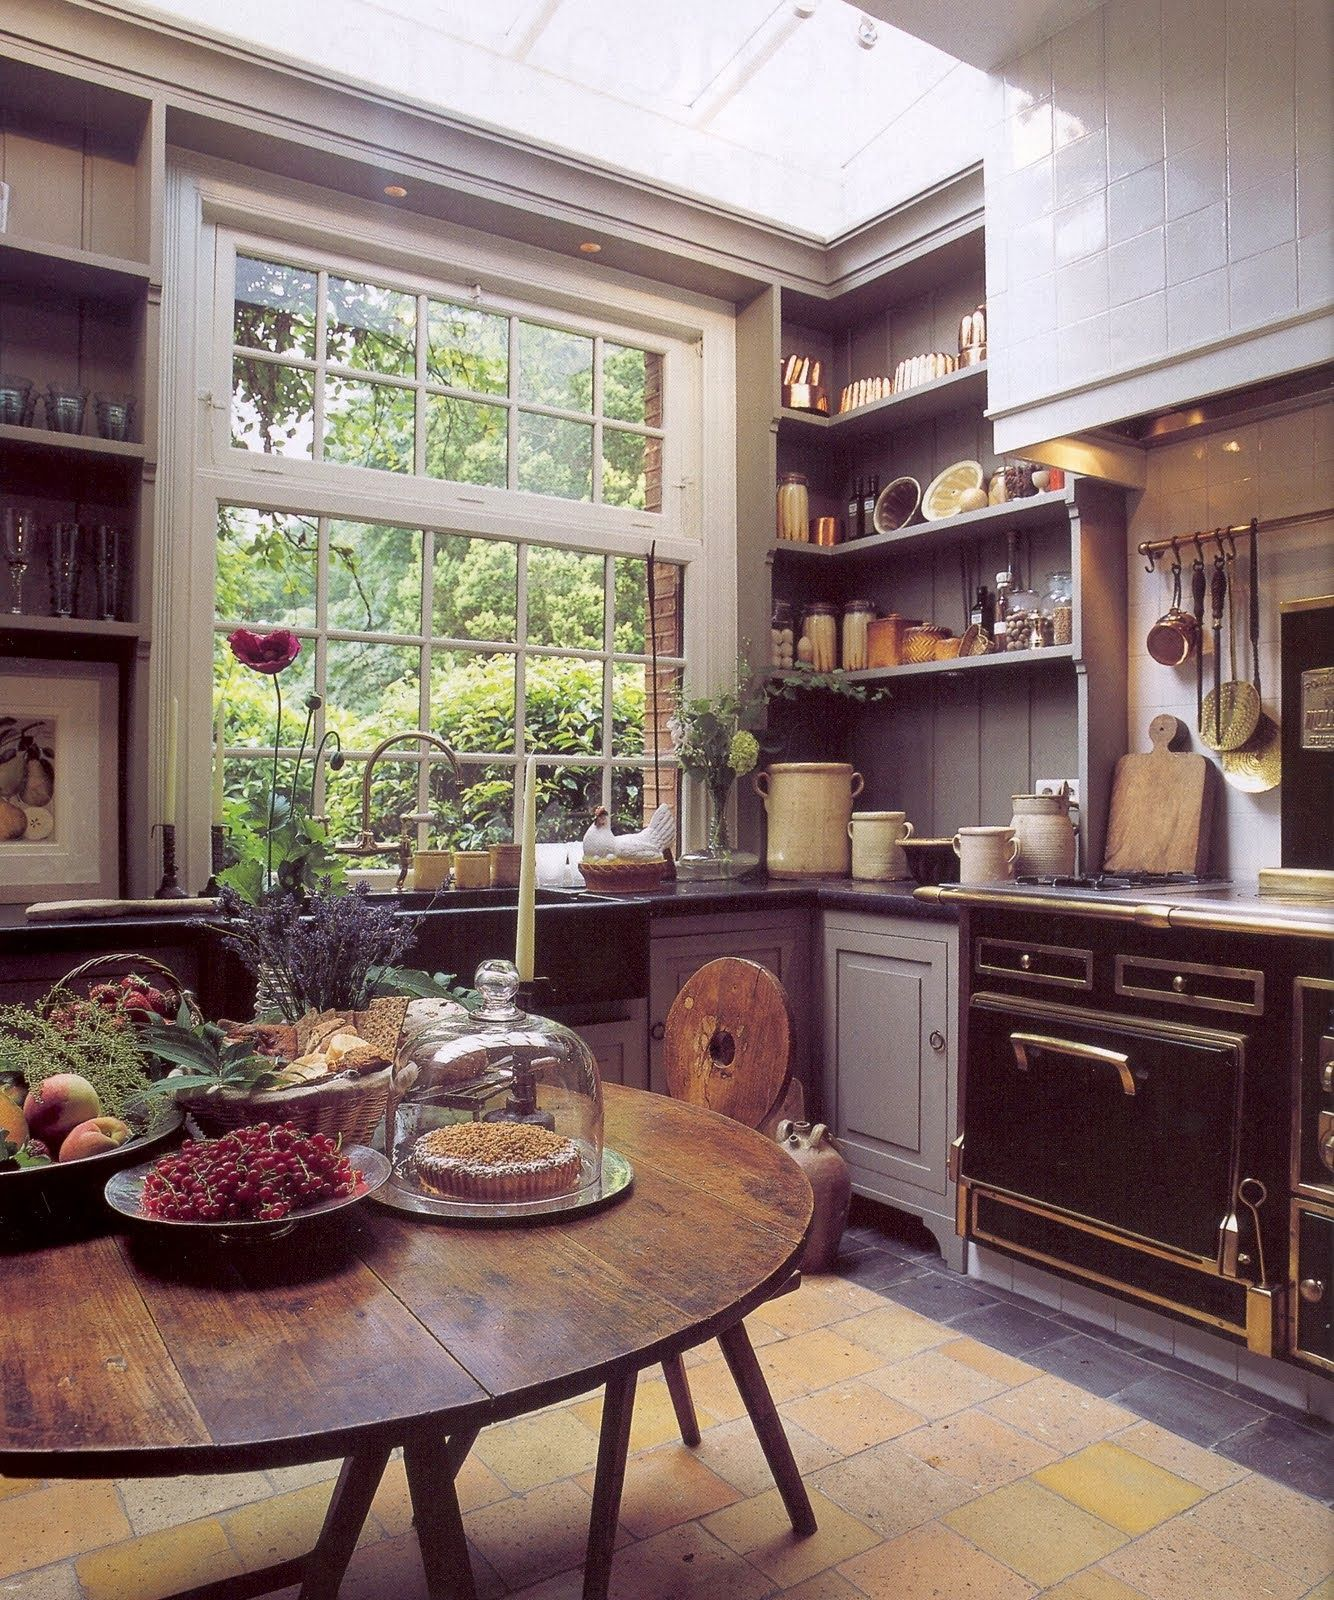 boho kitchen decor boho kitchen decor home kitchens boho kitchen on kitchen interior boho id=86313